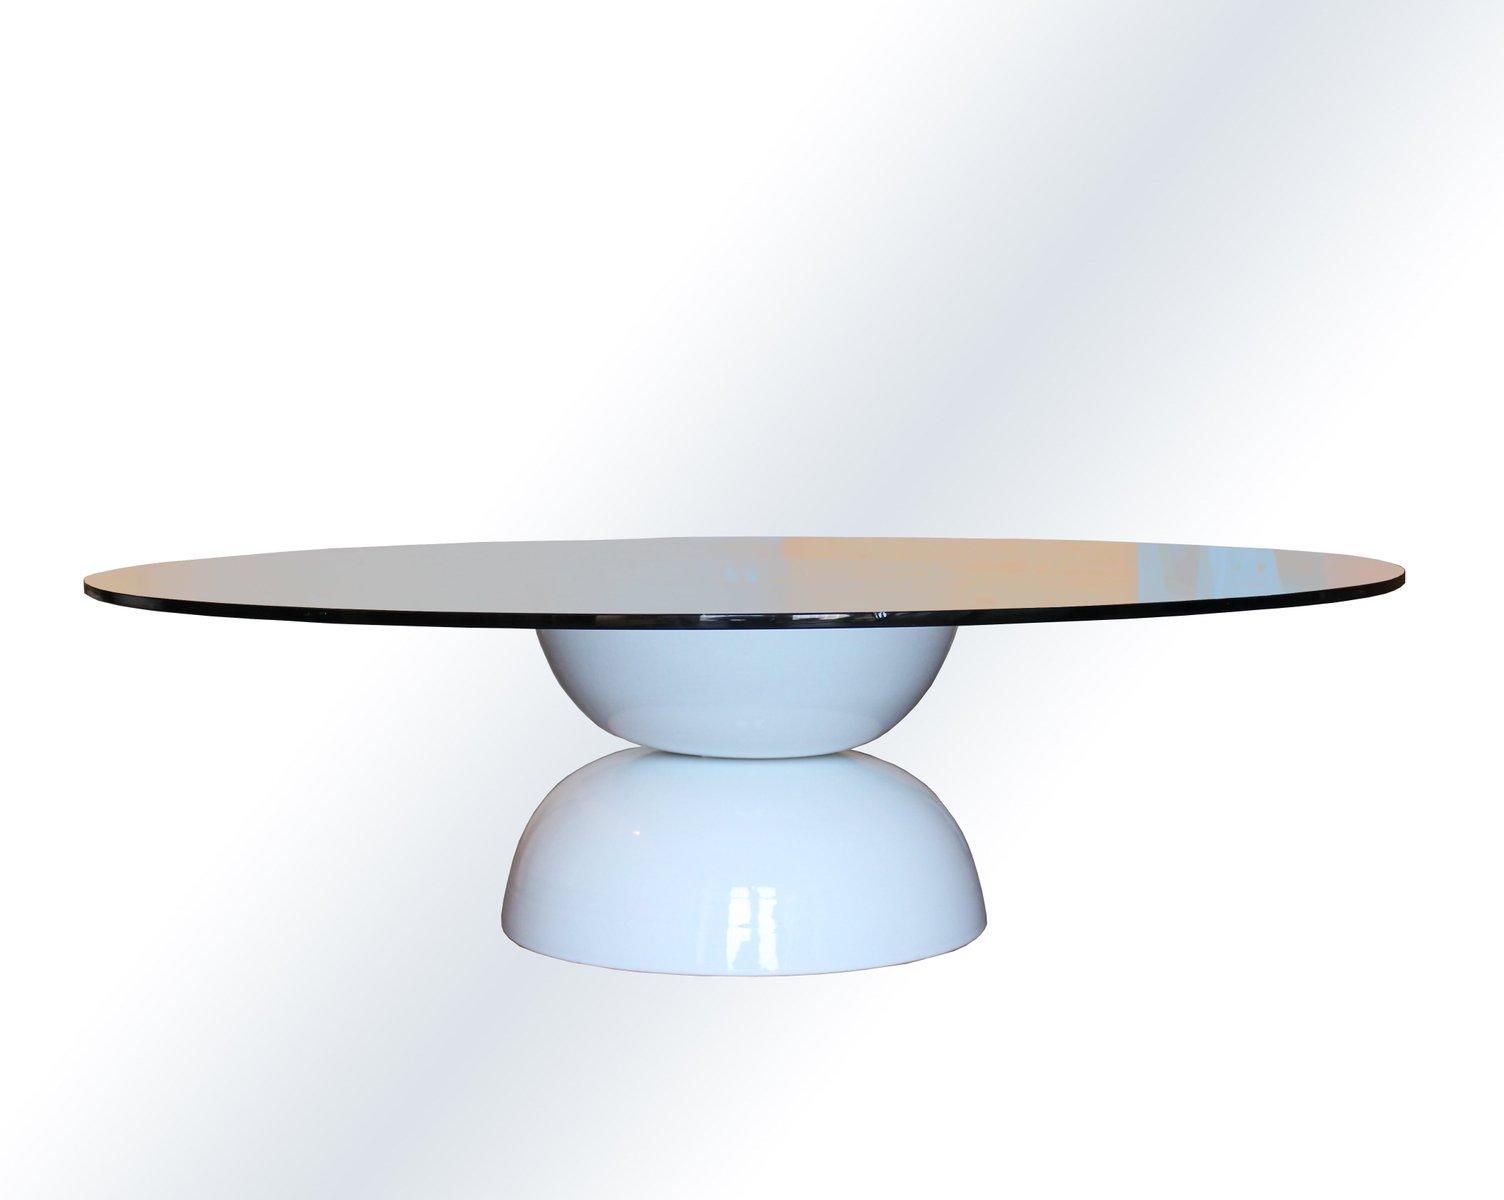 MM4 Couchtisch von Mascia Meccani für Meccani Design